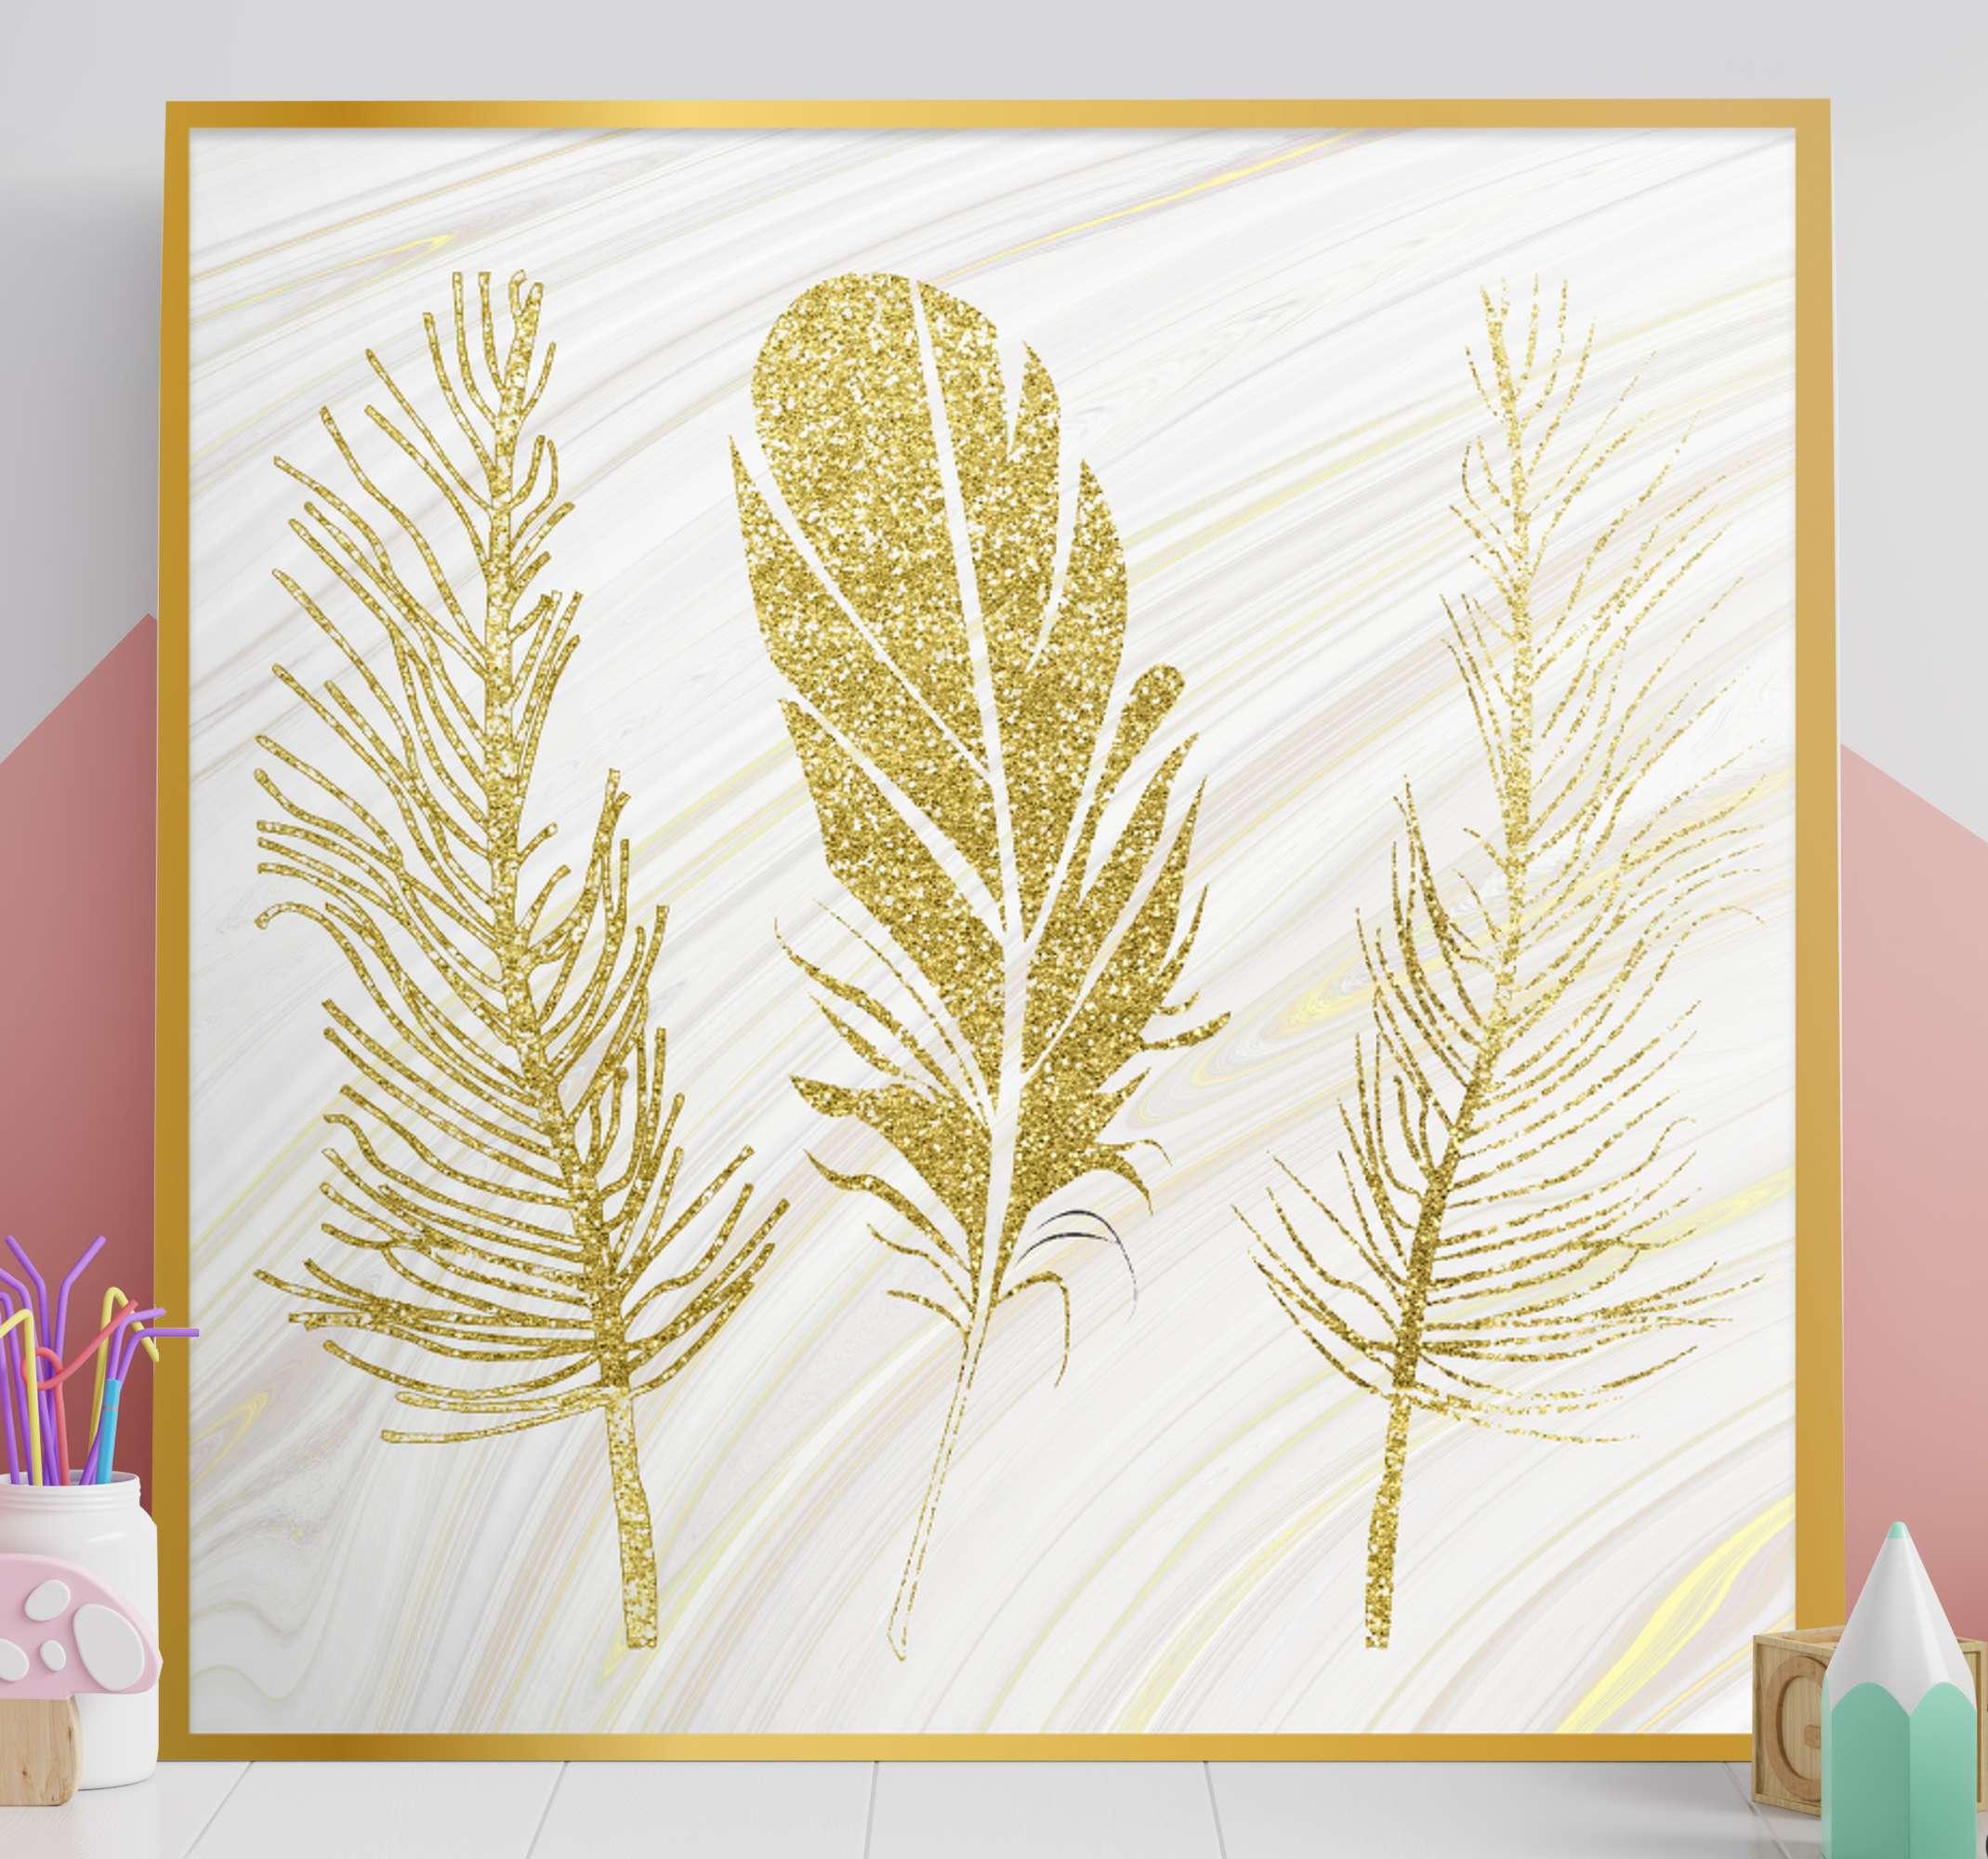 TenStickers. καμβά με χρυσό φτερό. μια εκπληκτική τέχνη τοίχου από φτερό που είναι μοντέρνα και κομψή. εξοικονομήστε 10% από την πρώτη σας παραγγελία όταν εγγραφείτε σήμερα.